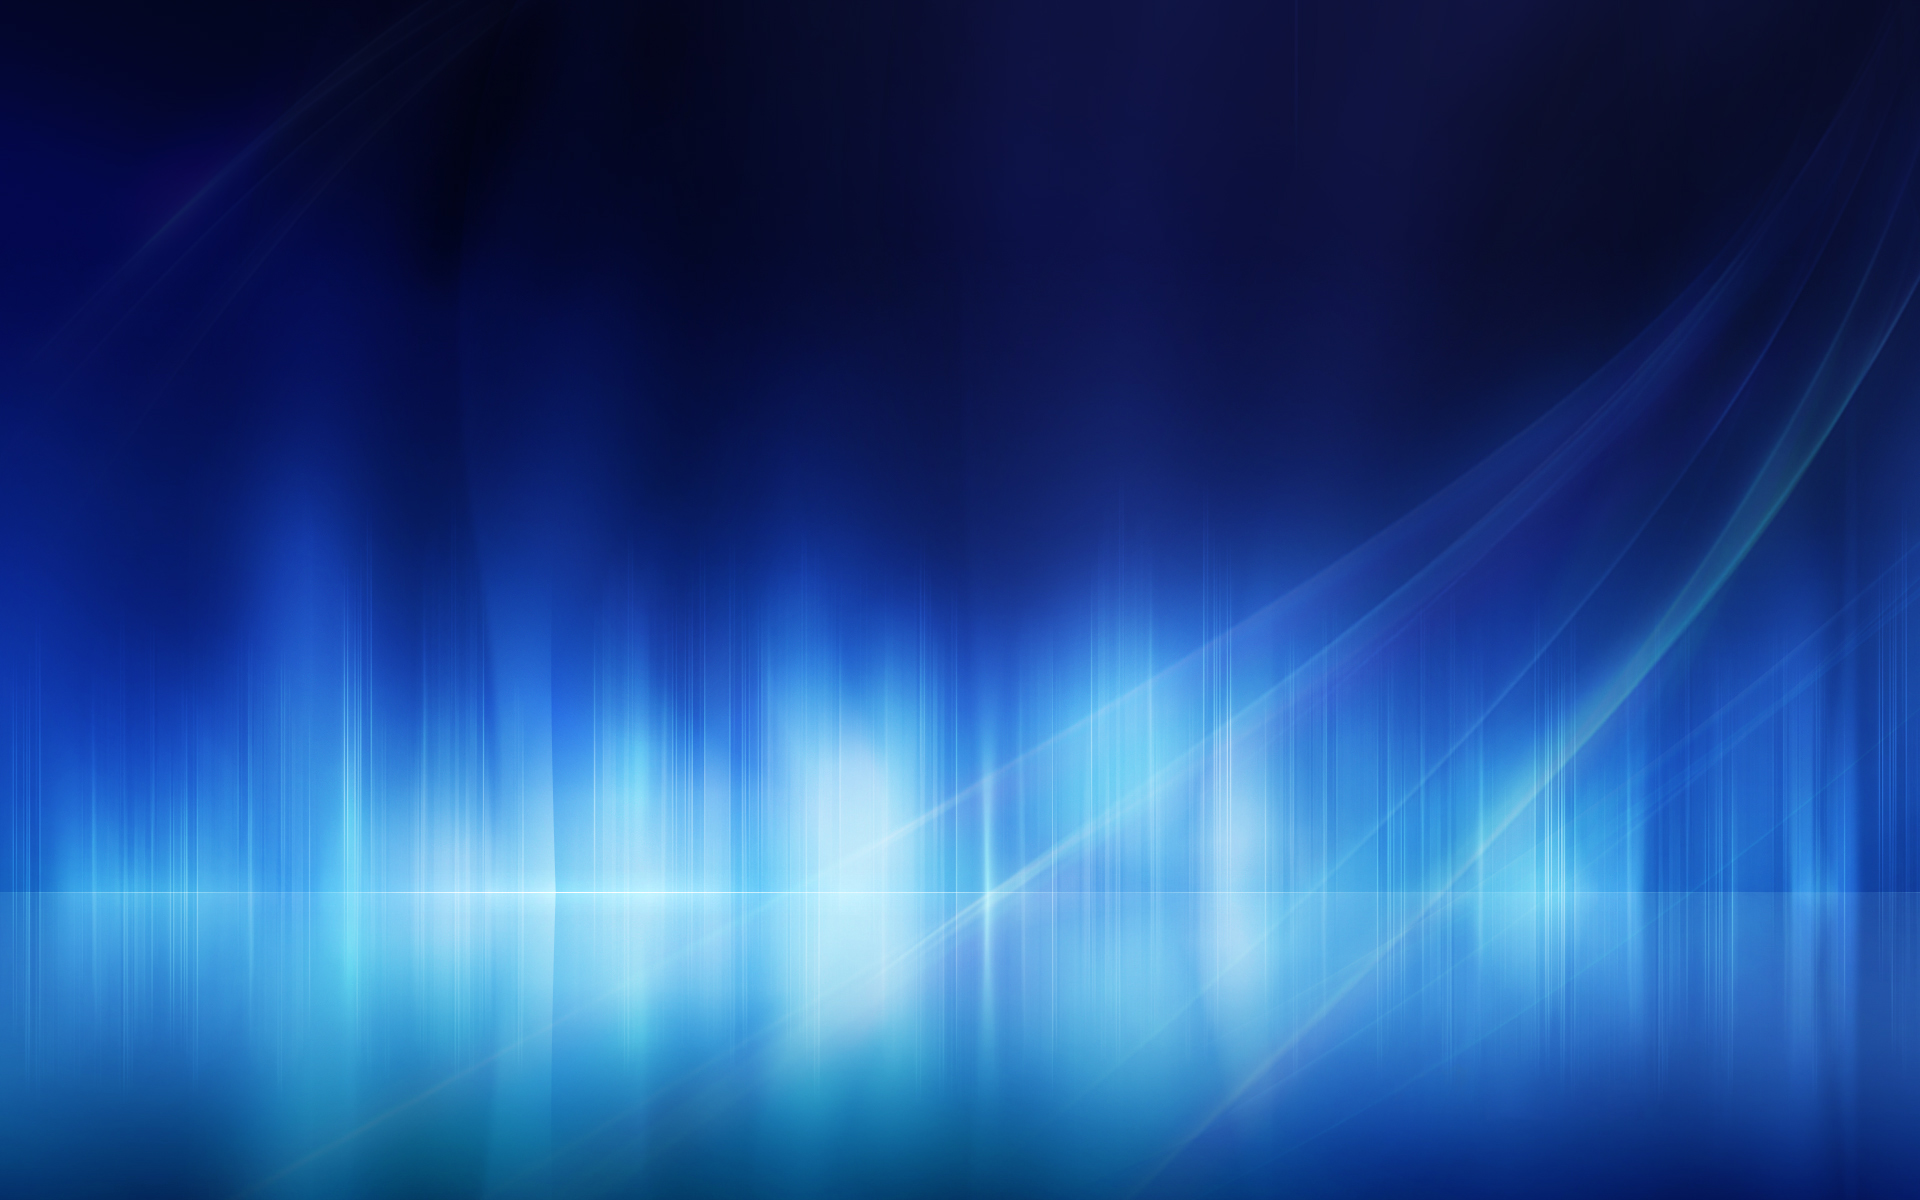 blue wallpaper aurora by thedisturbed0ne customization wallpaper 1920x1200